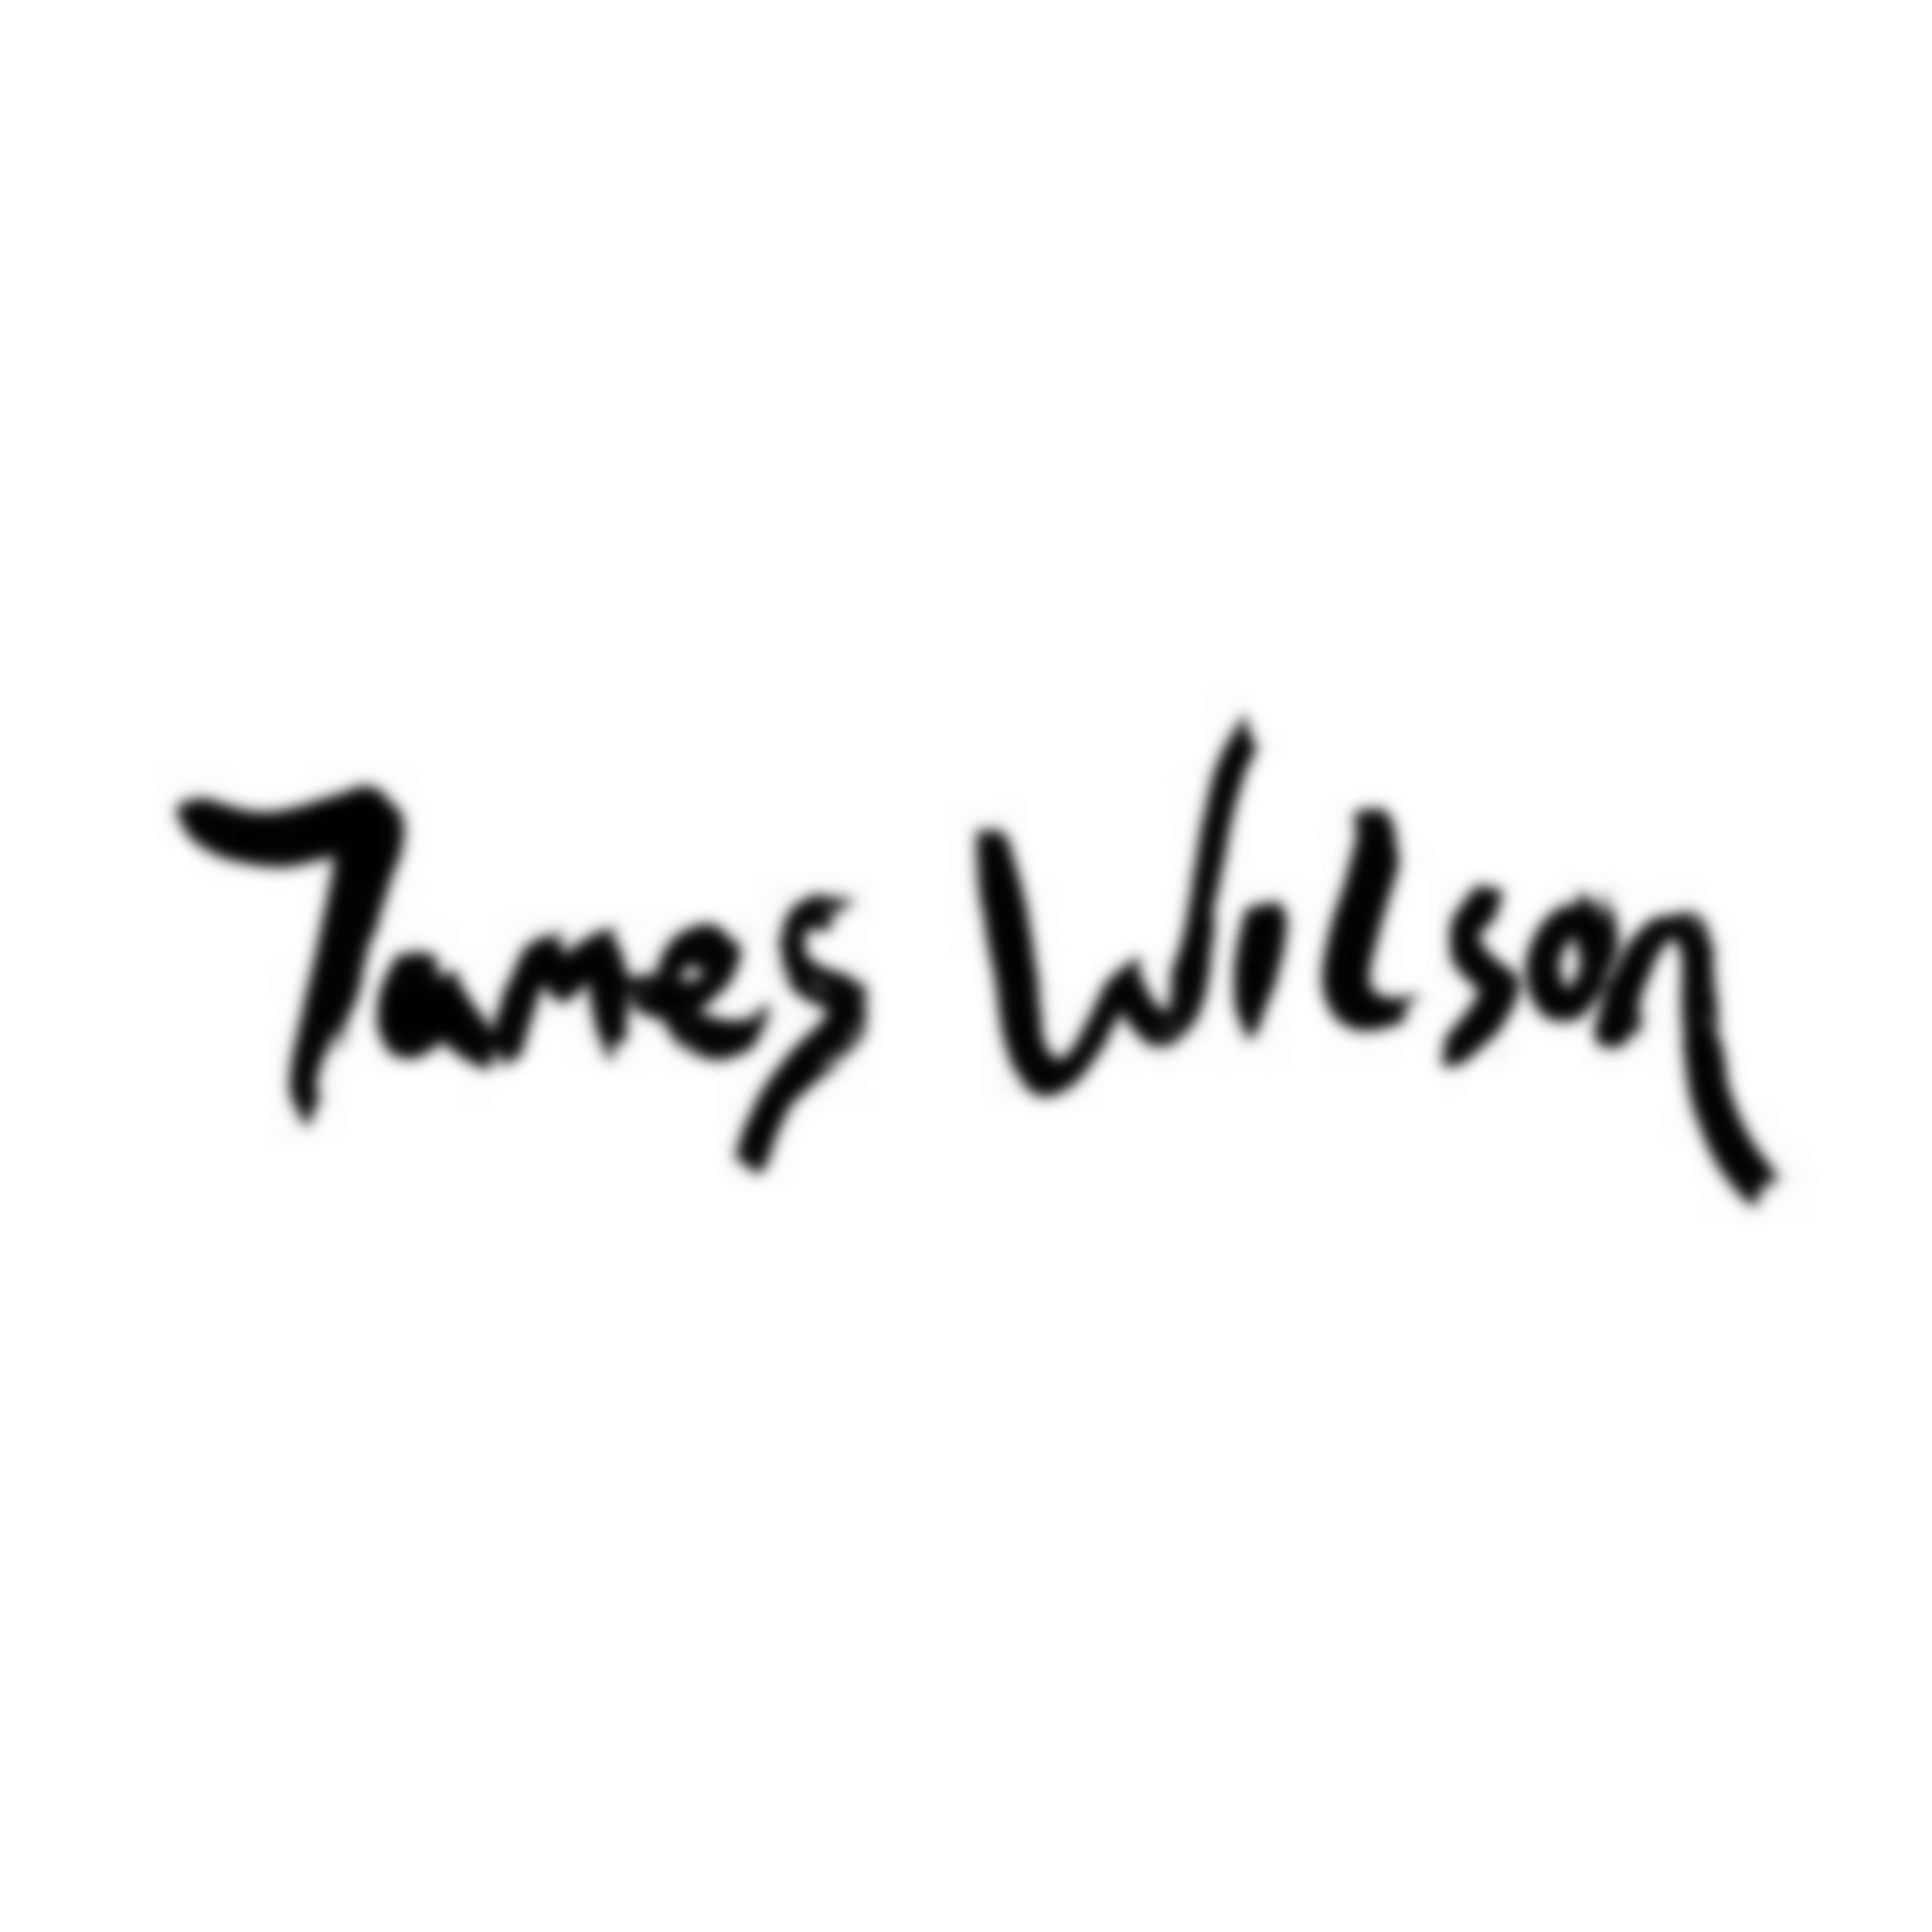 James Wilson logo